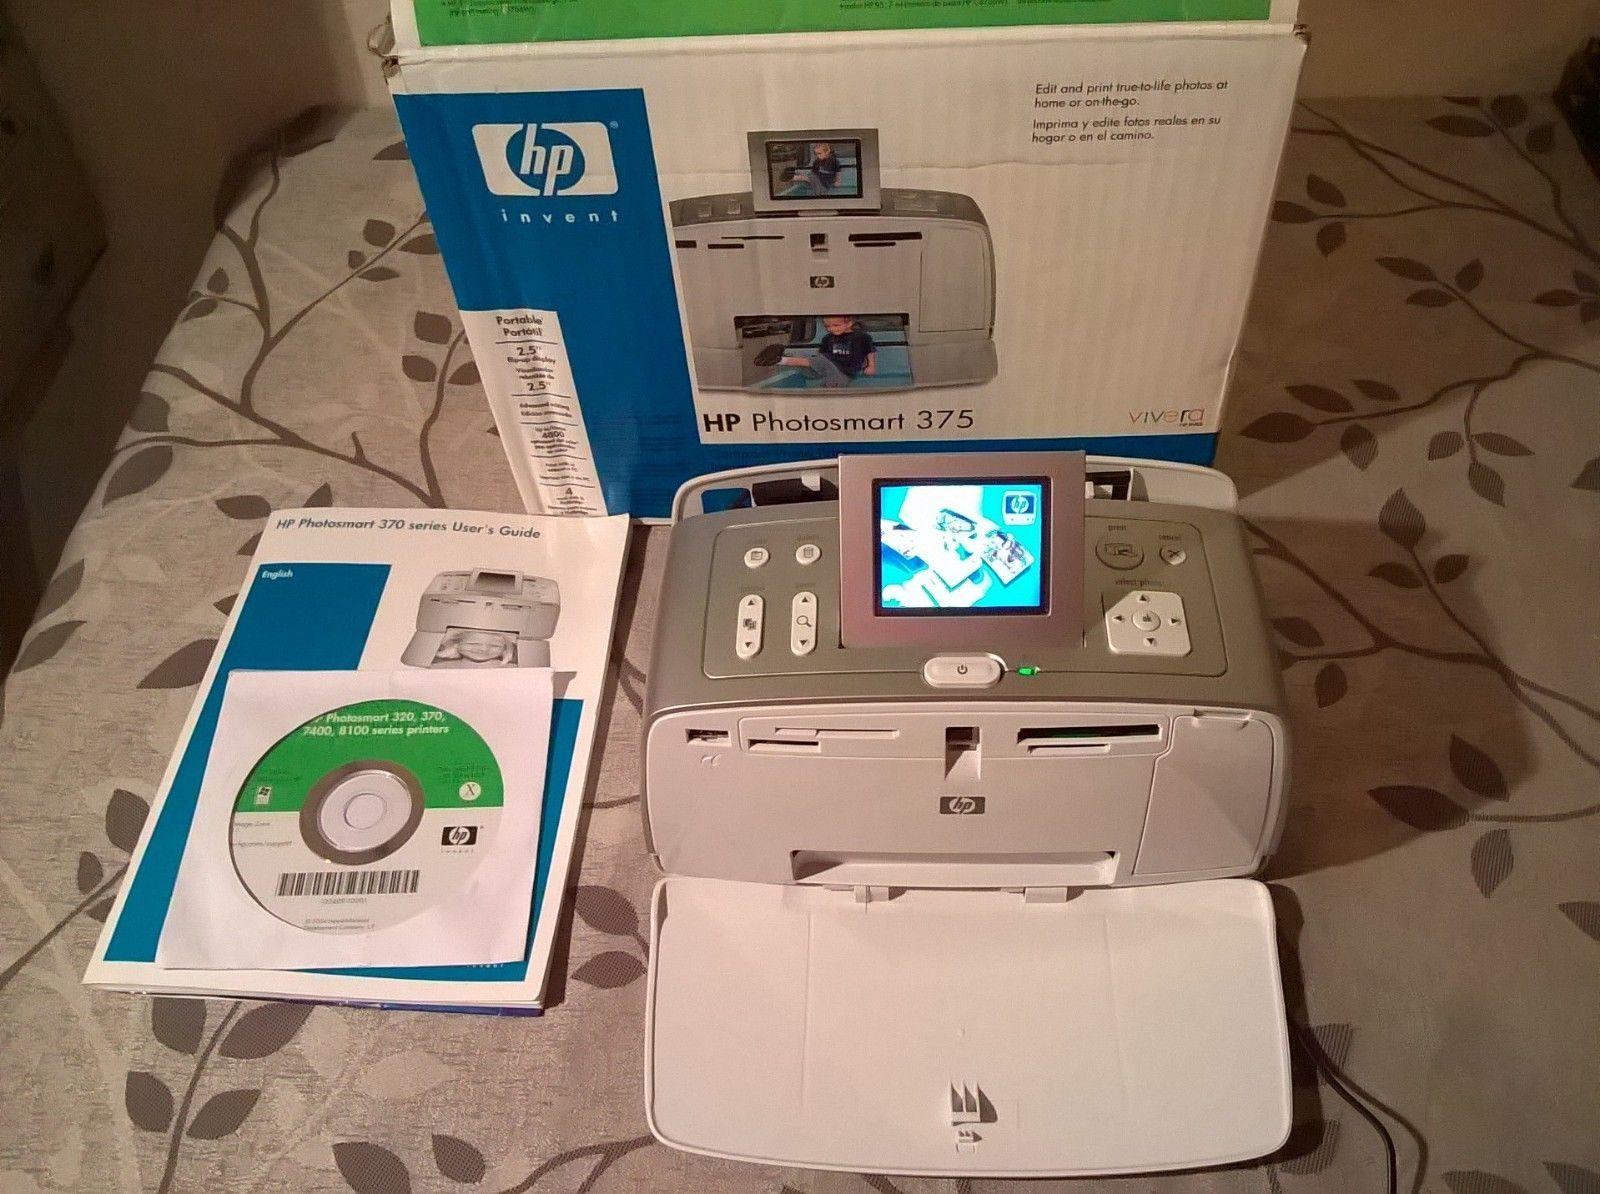 Hp photosmart 375 digital photo inkjet printer with power cord